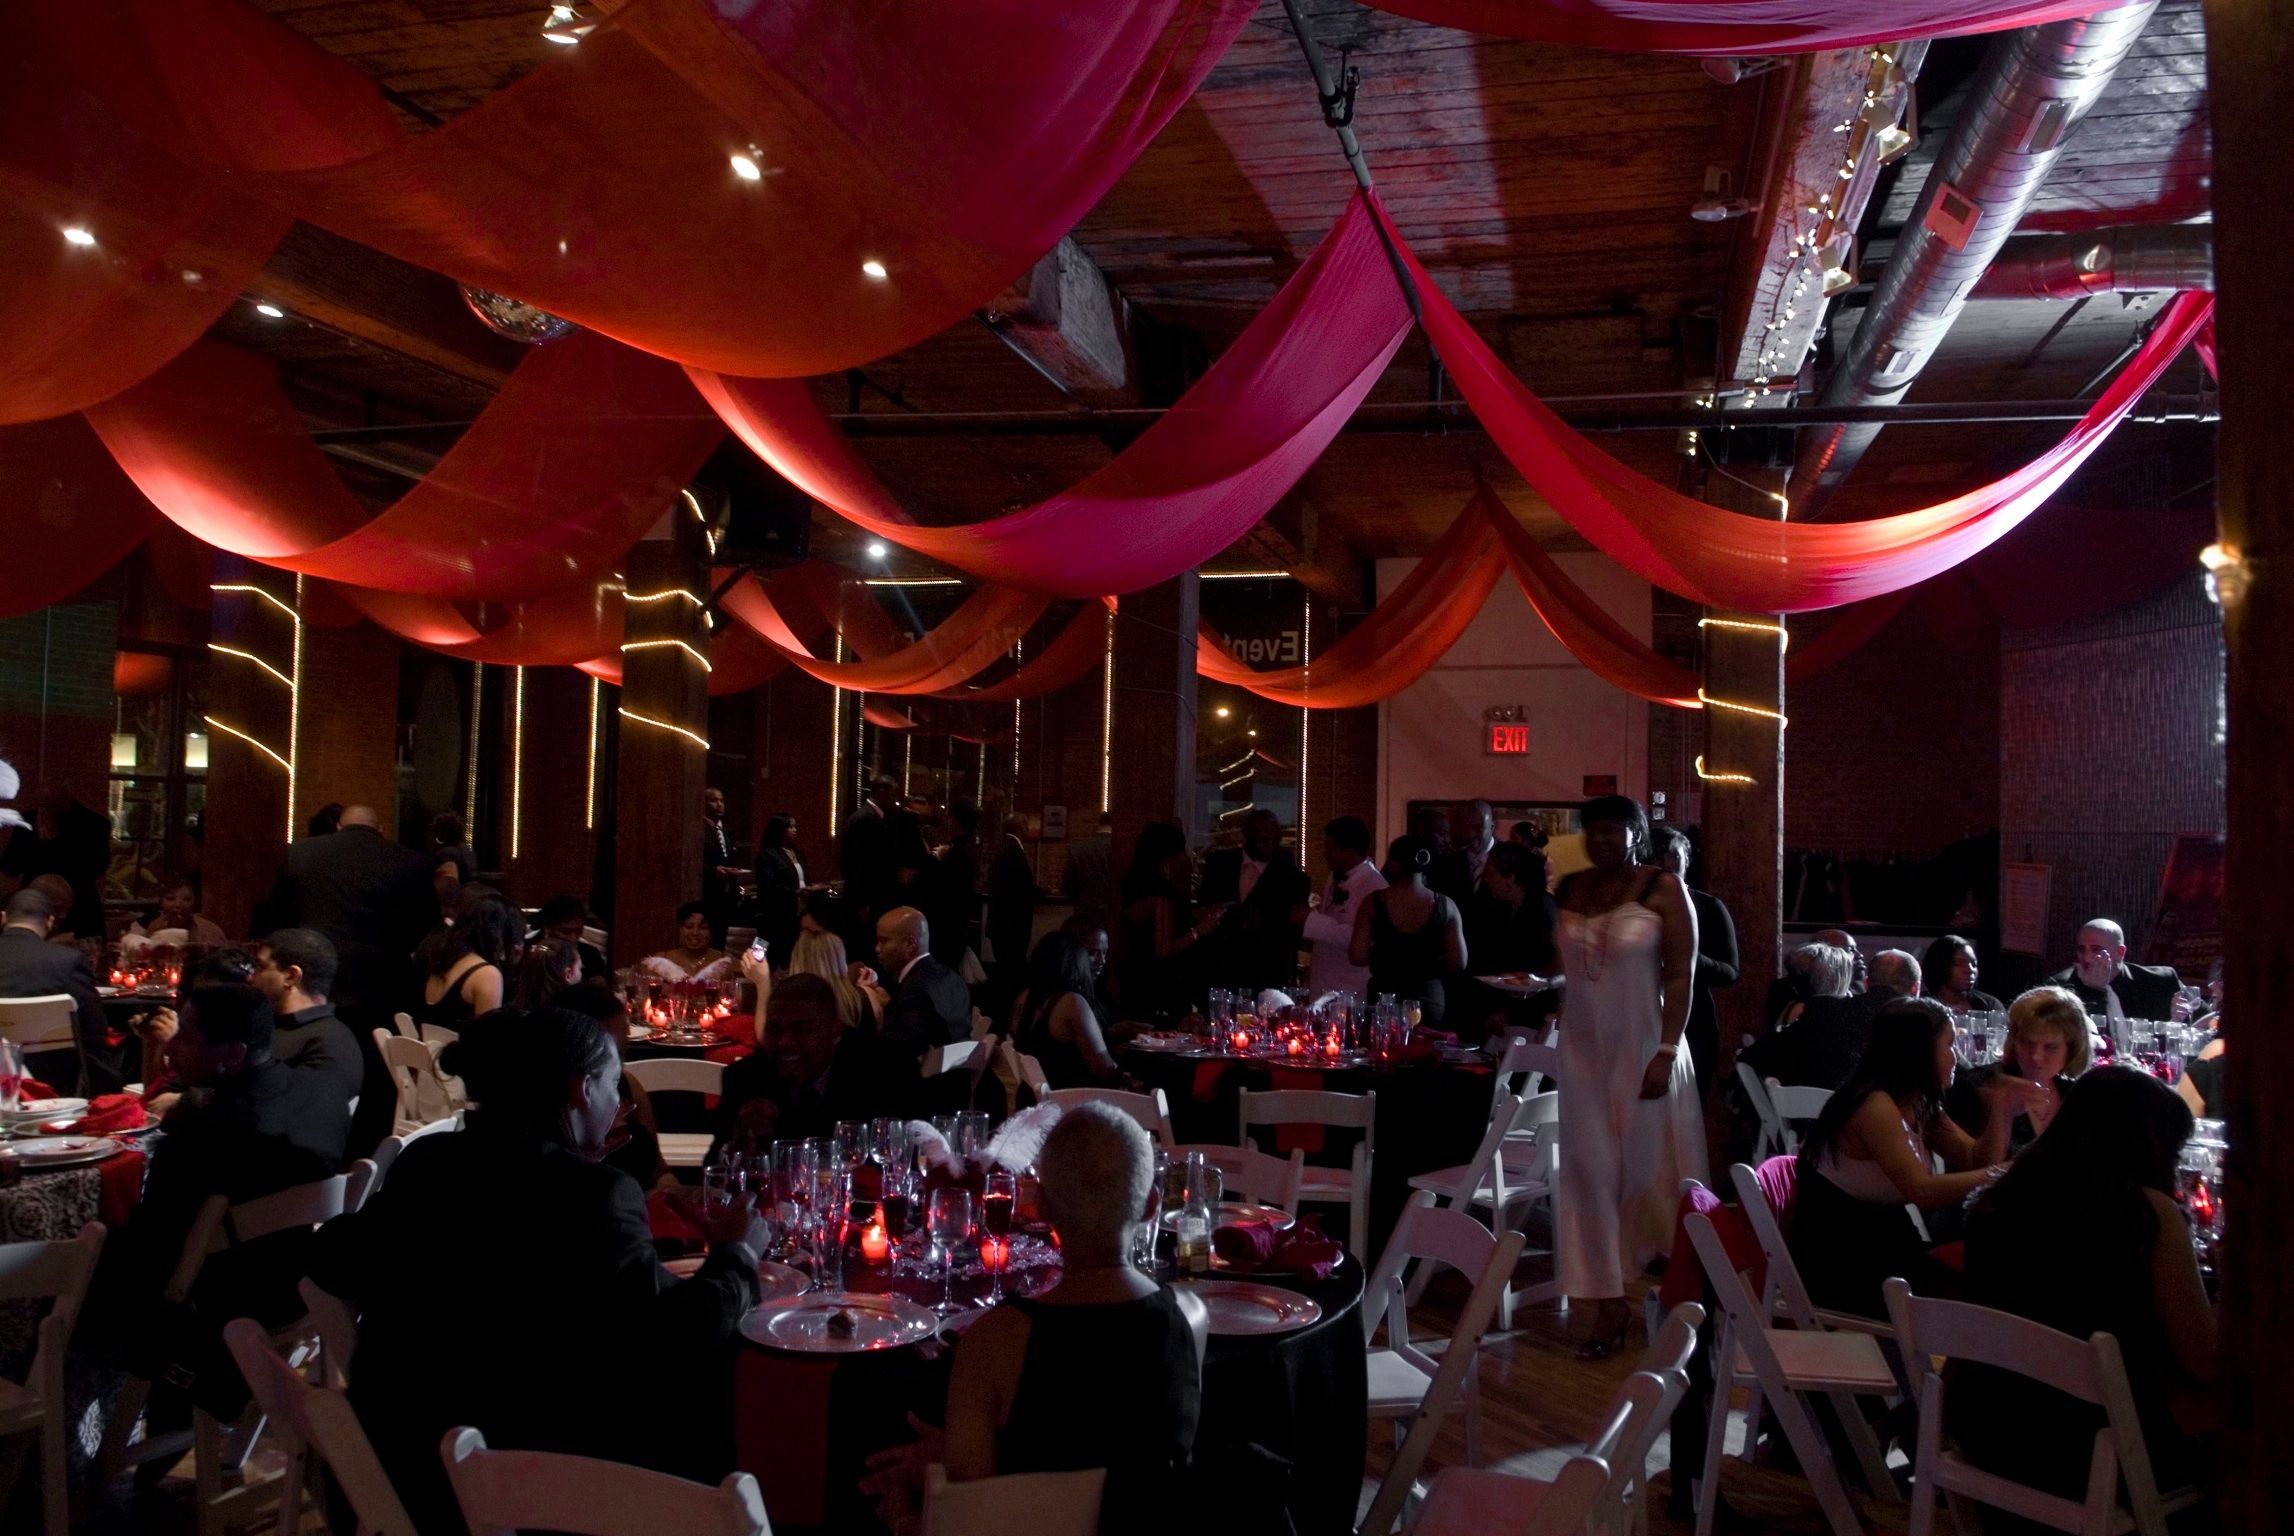 Inside wedding decoration ideas  Reception of Old Hollywood theme wedding  Prom  Pinterest